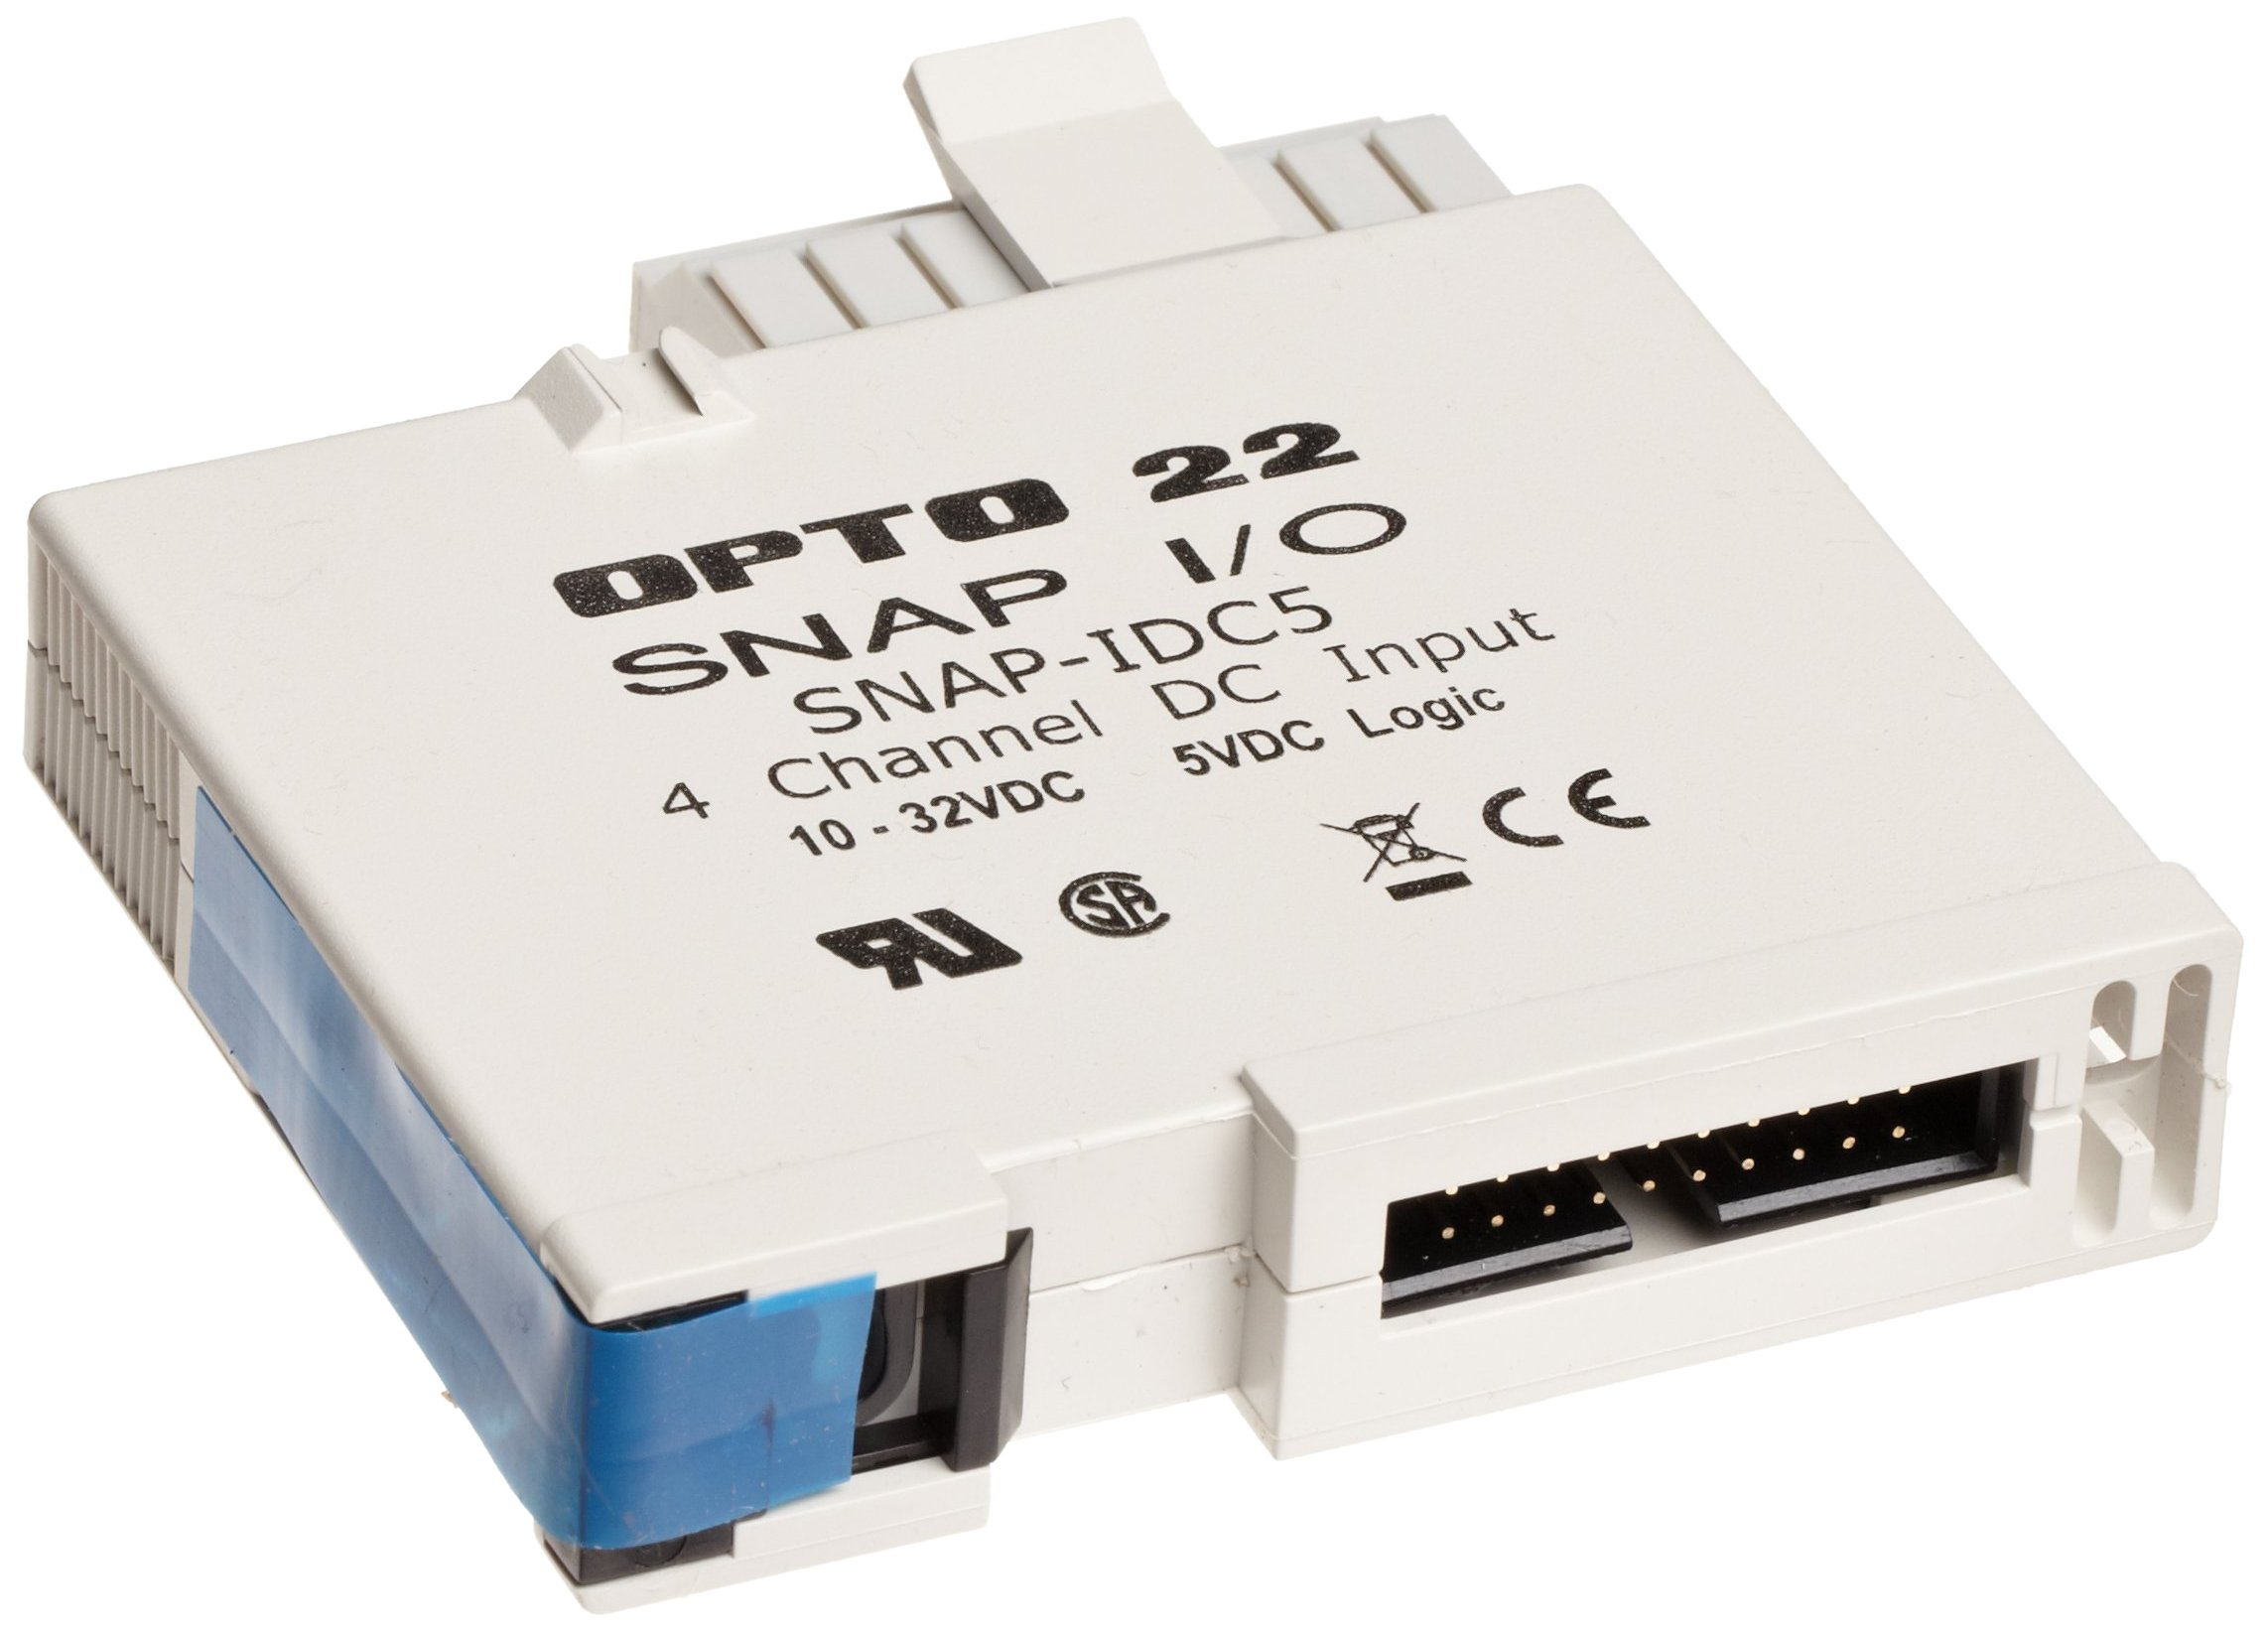 Opto 22 SNAP-IDC5 - SNAP Digital (Discrete) Input Module, 4-Channel, 10-32 VAC/VDC